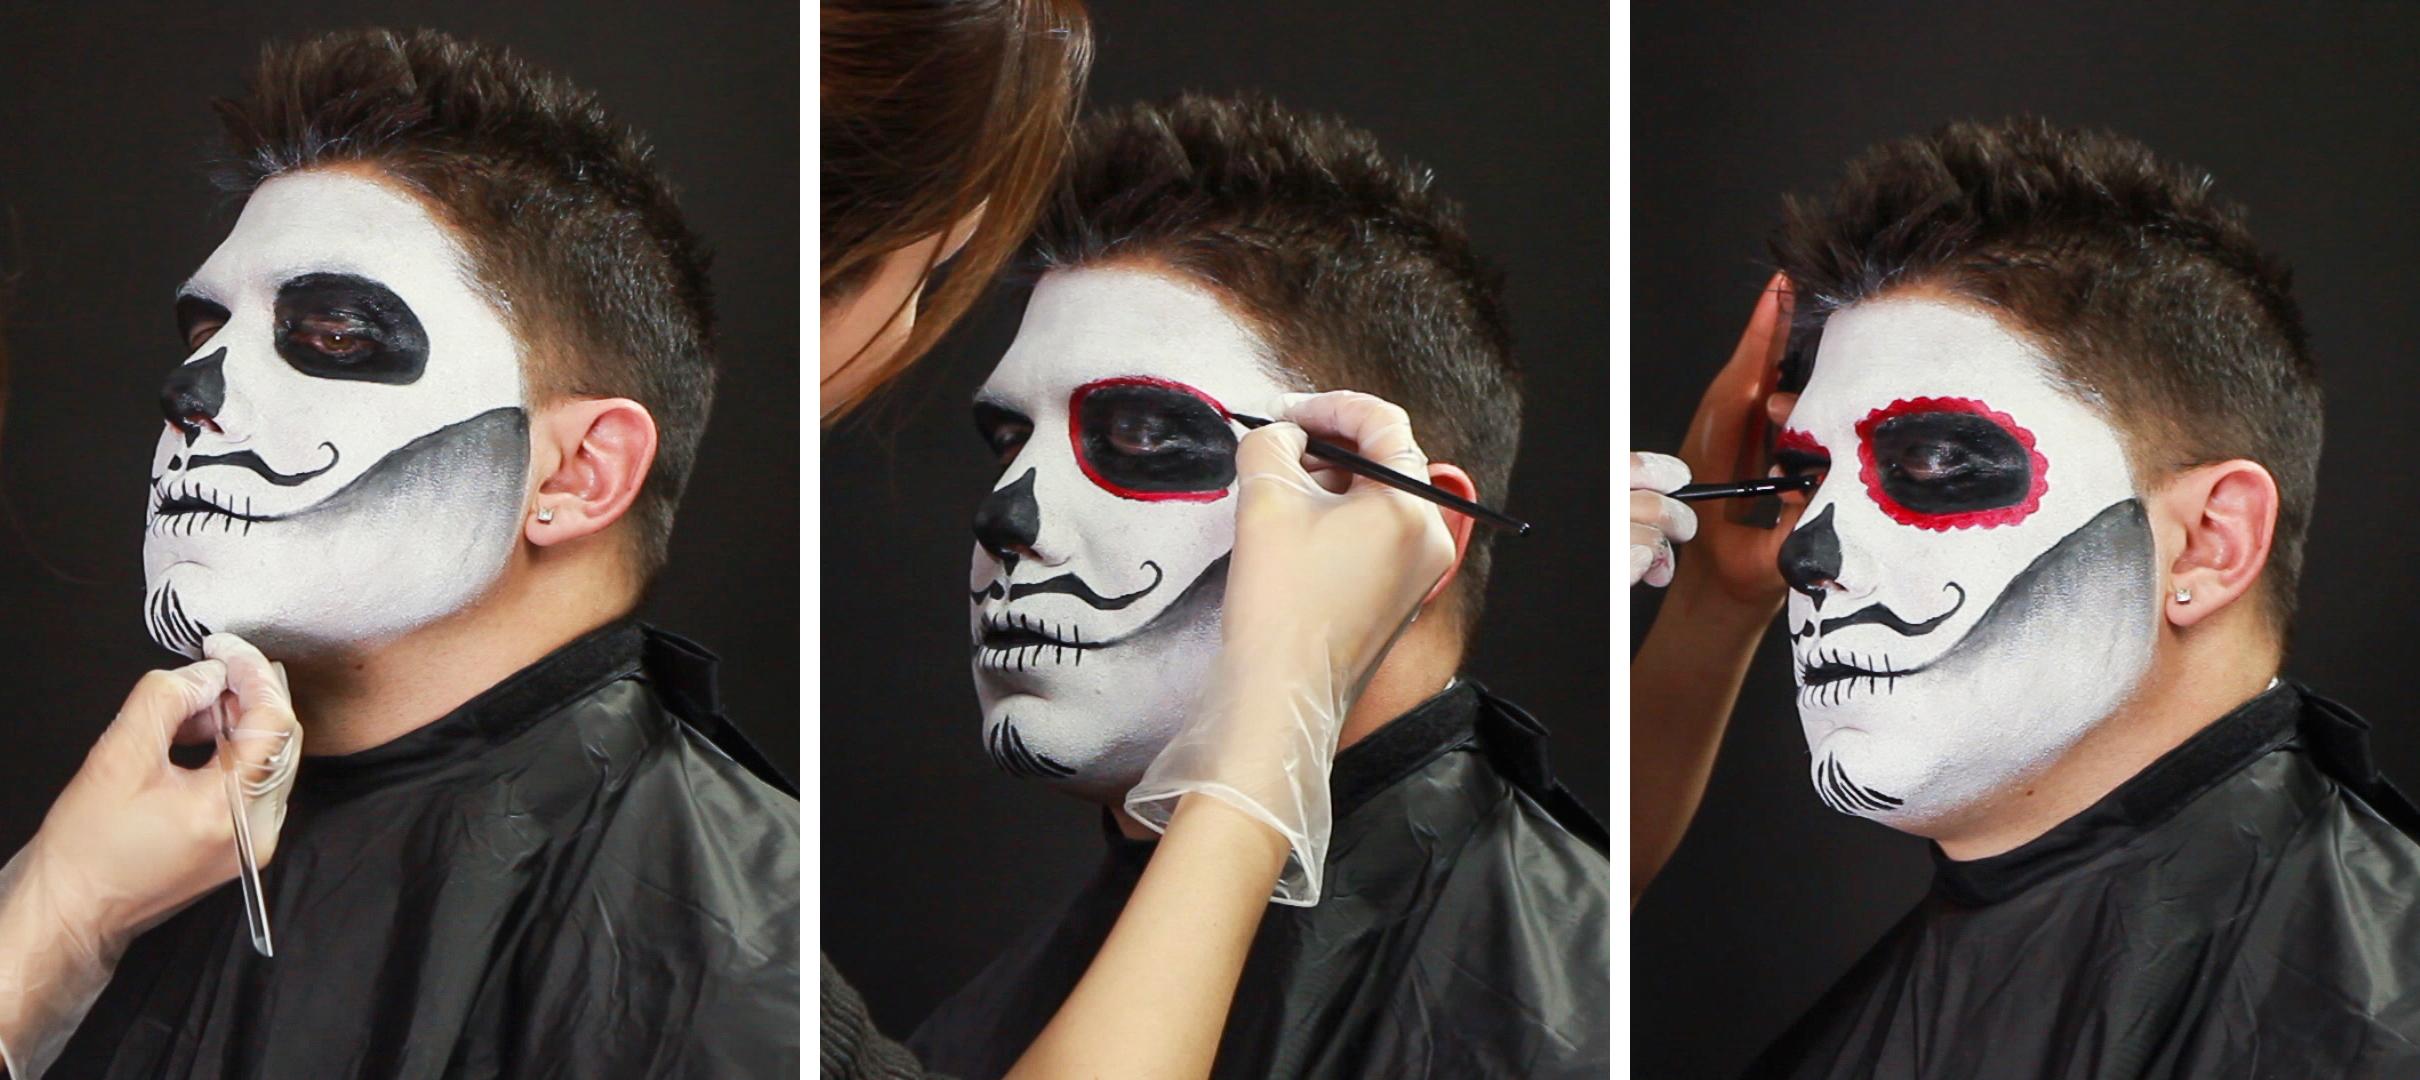 Scary Face paint idea